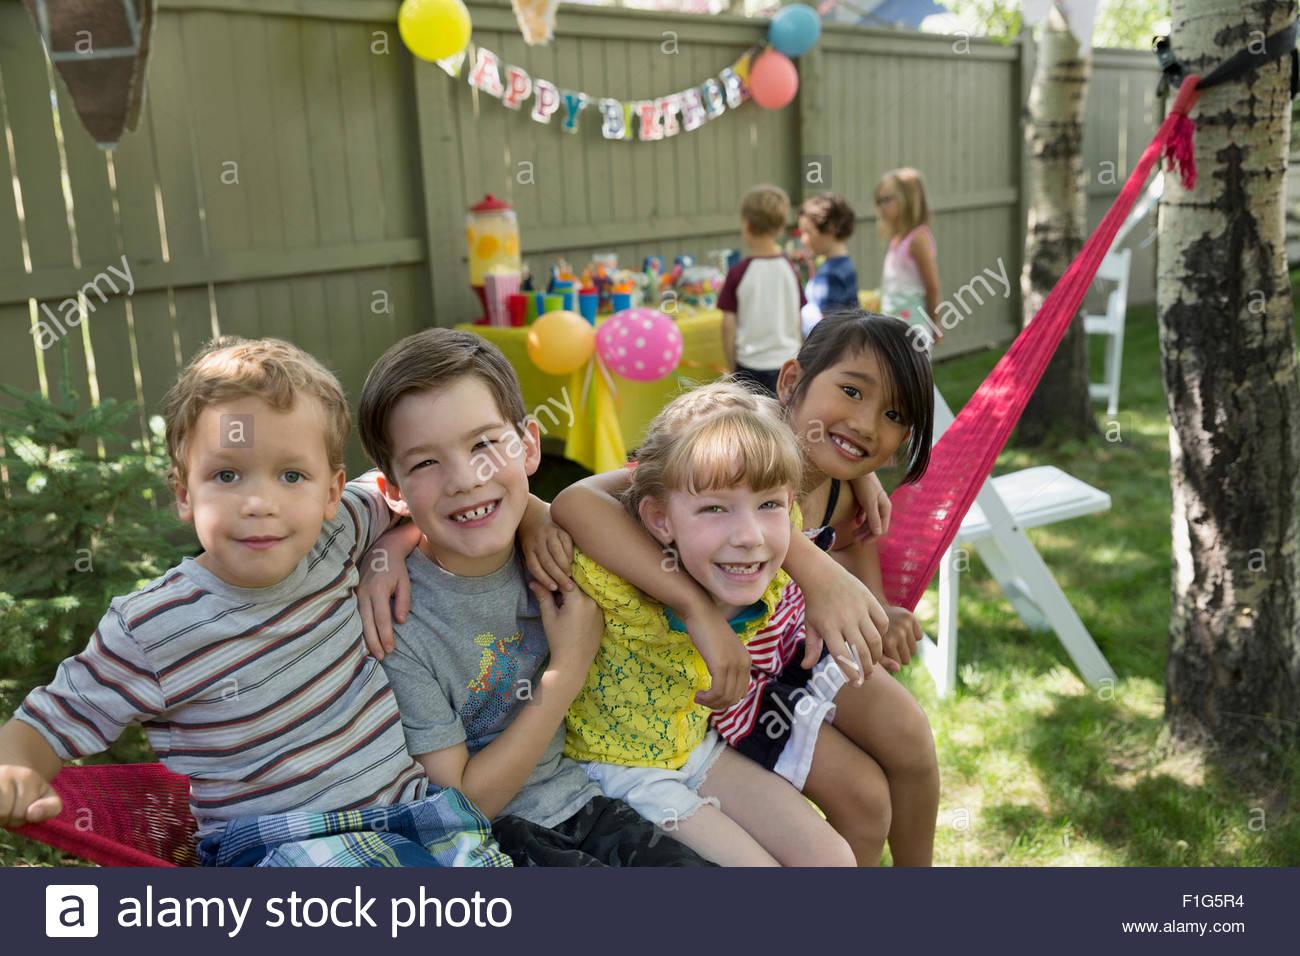 Portrait smiling kids hammock backyard birthday party - Stock Image